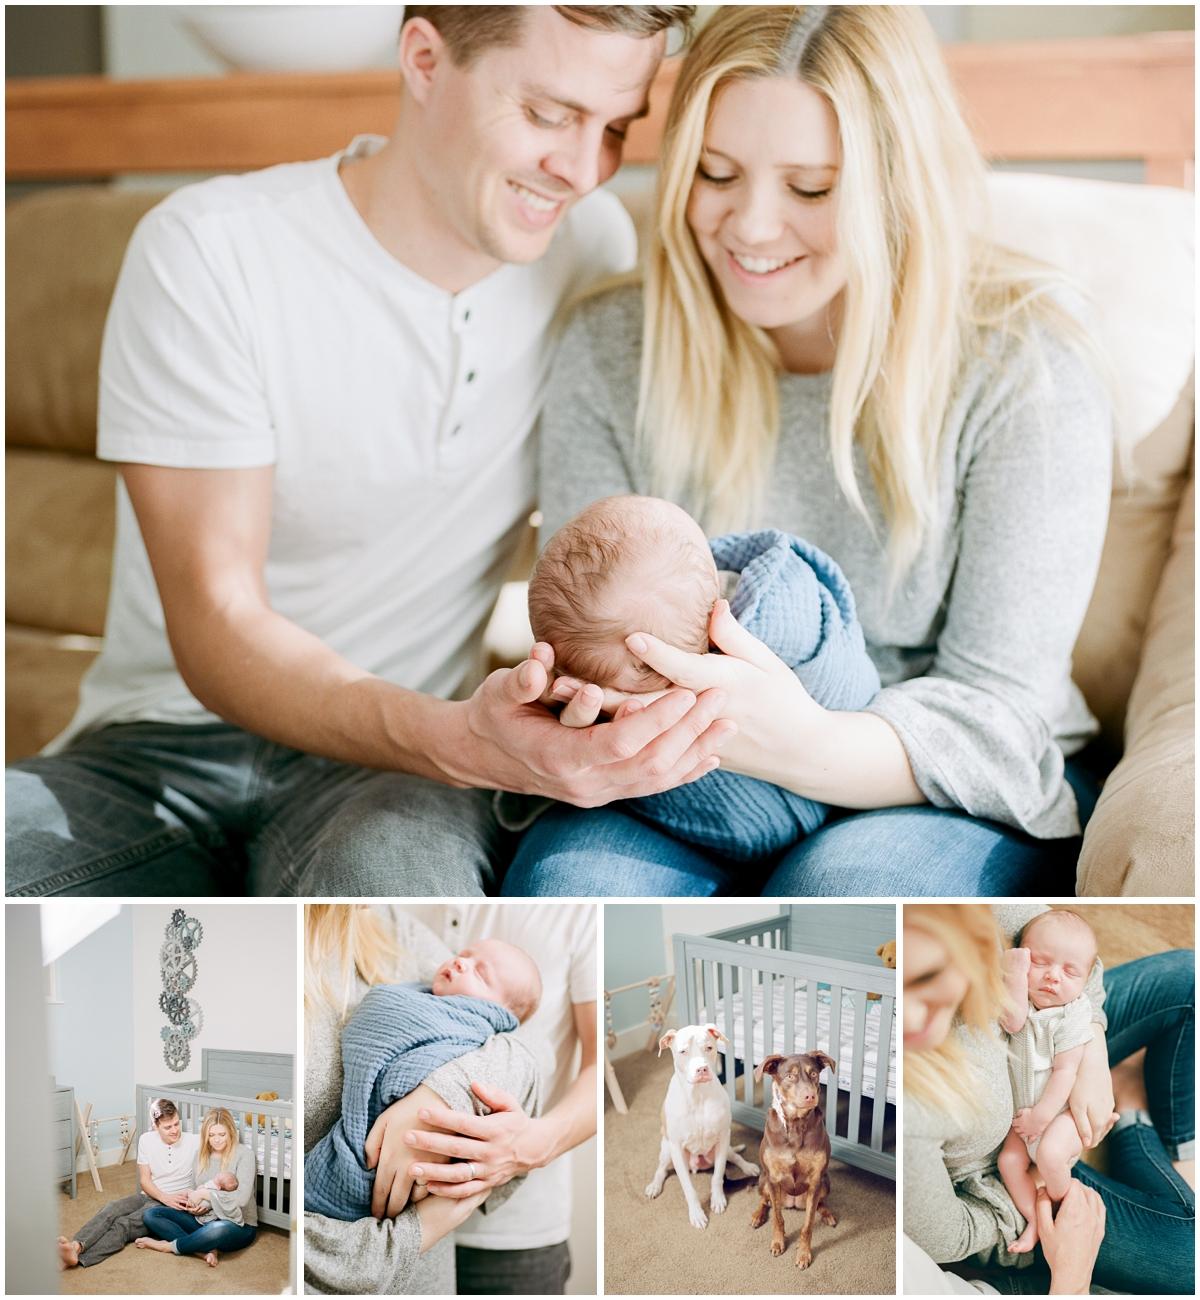 baby-photographer-northern-californiajpg